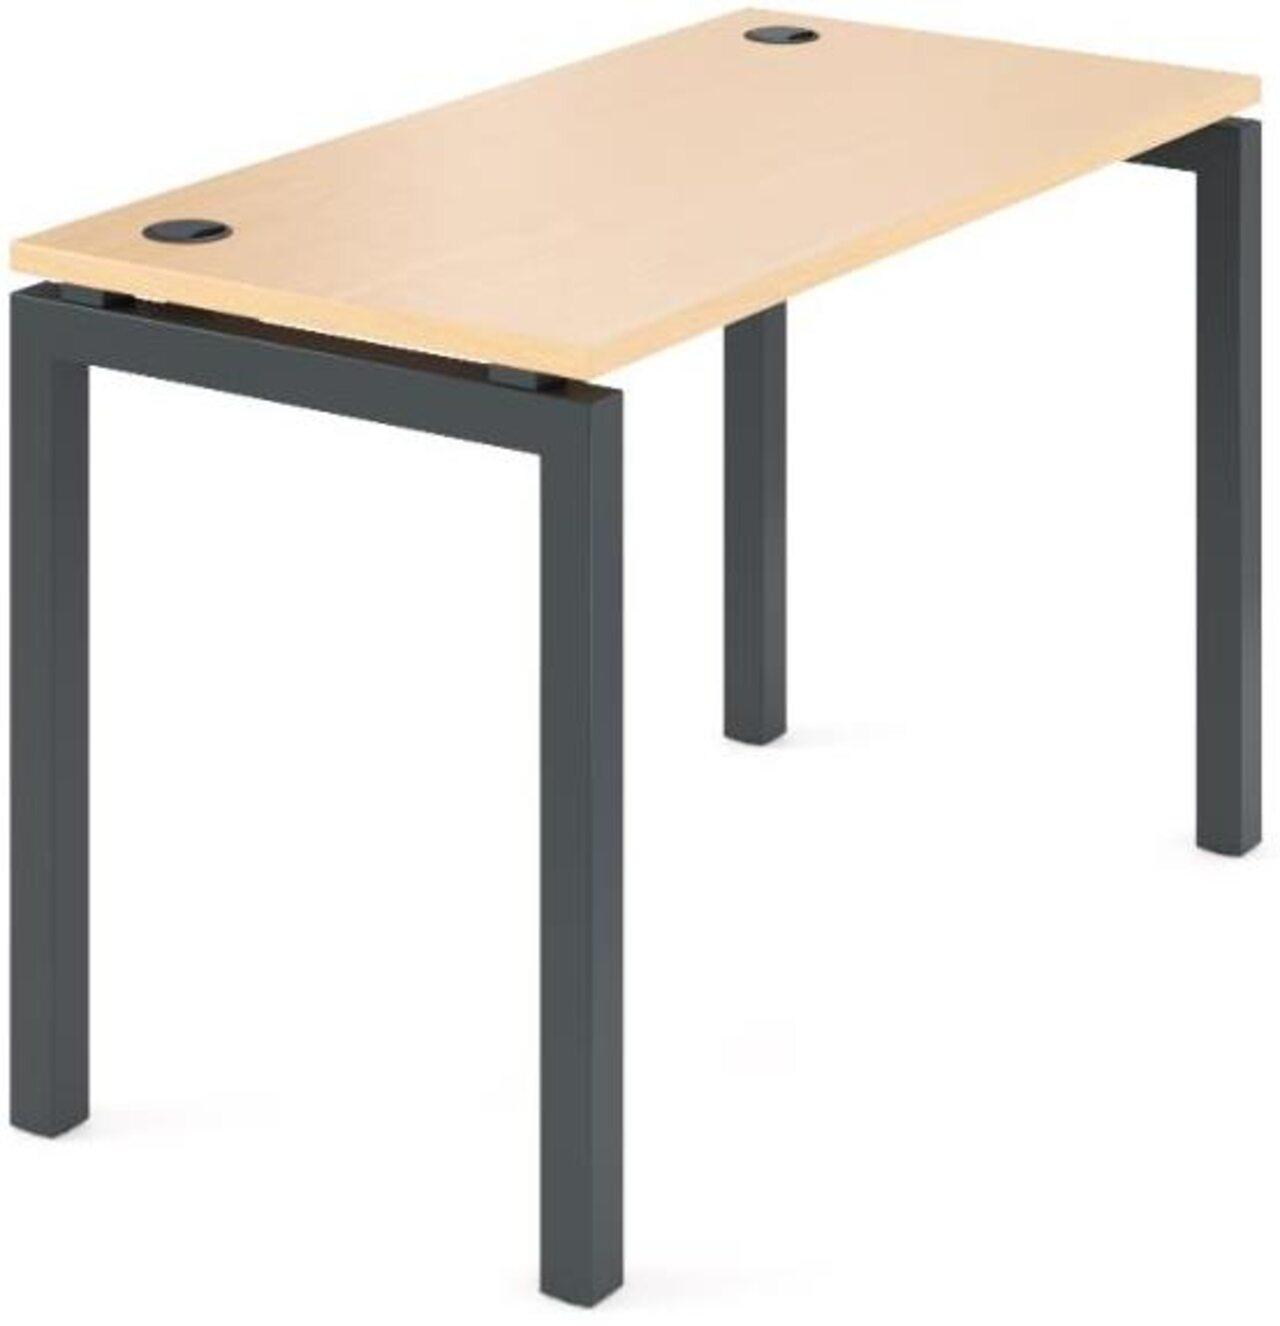 Стол на металлокаркасе  Арго 120x60x76 - фото 4